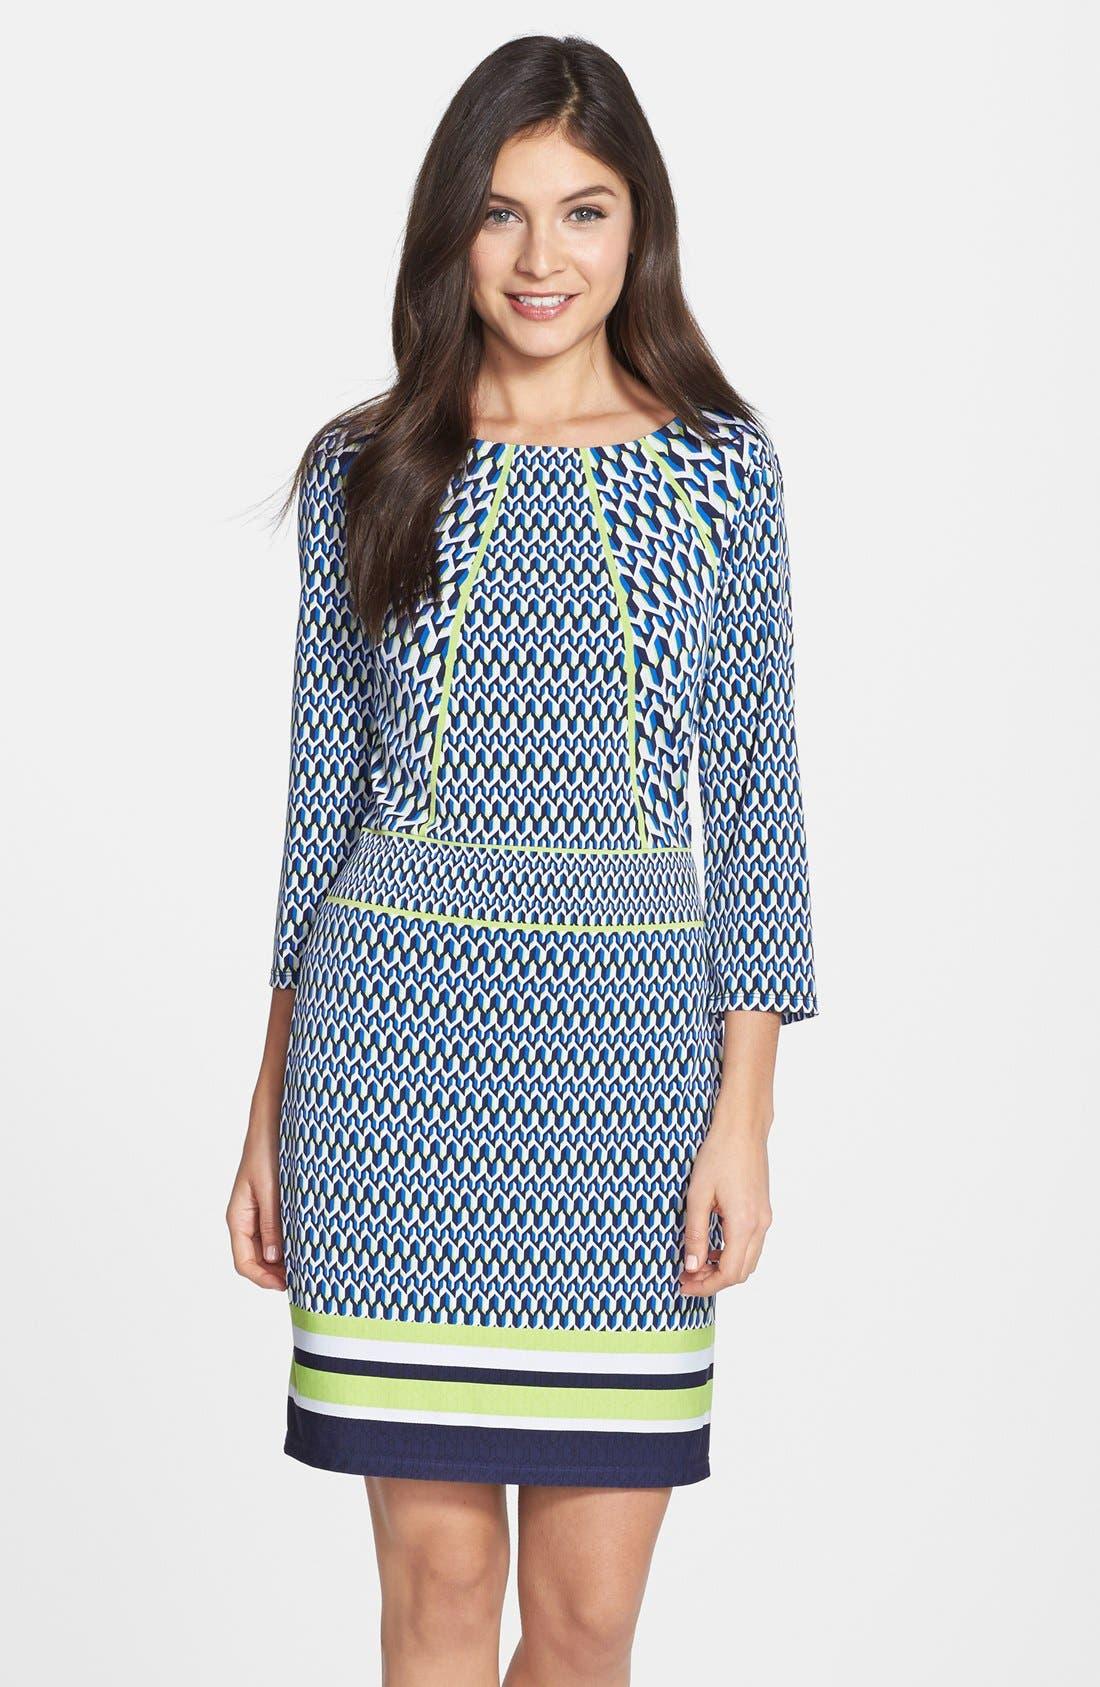 Alternate Image 1 Selected - Laundry by Shelli Segal Print Jersey Sheath Dress (Regular & Petite)